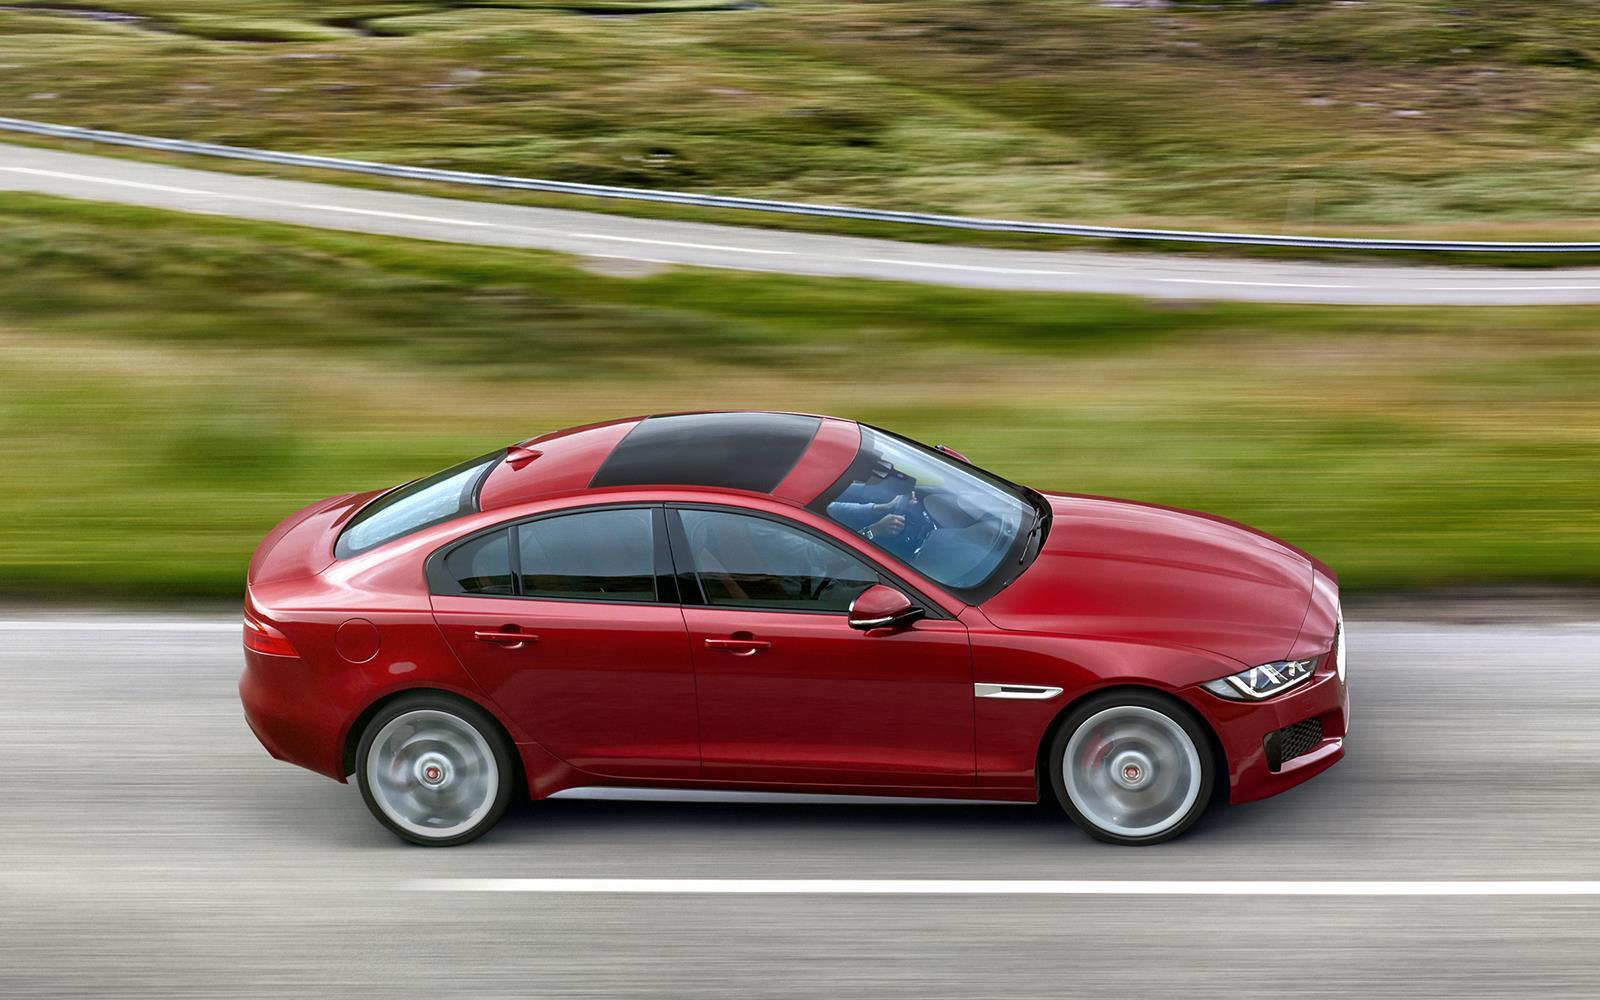 Coming Soon 2015 Jaguar XE